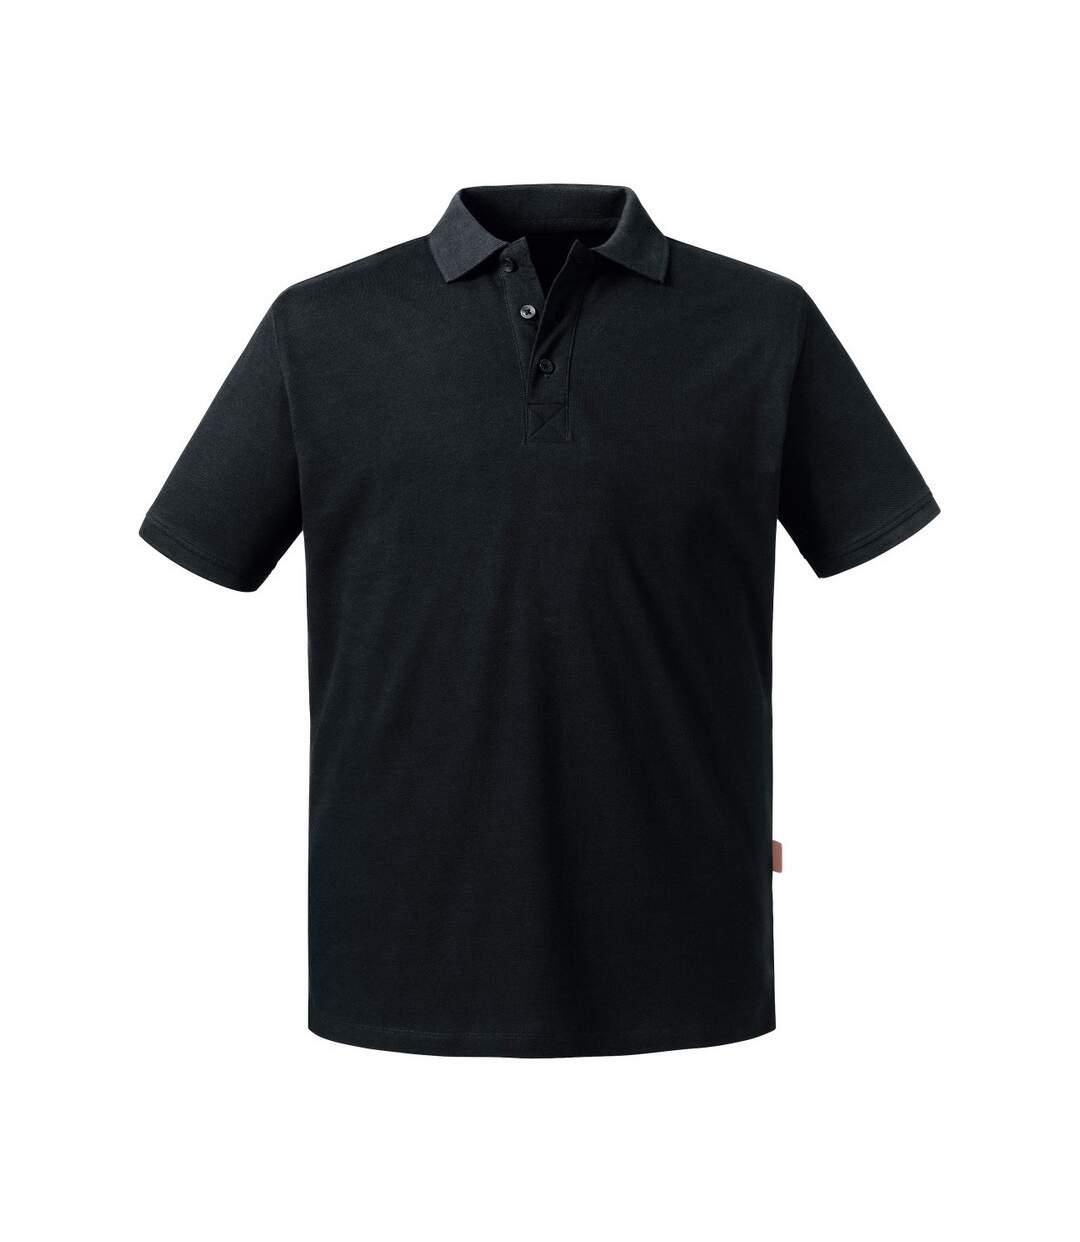 Russell Mens Pure Organic Polo (Black) - UTBC4664